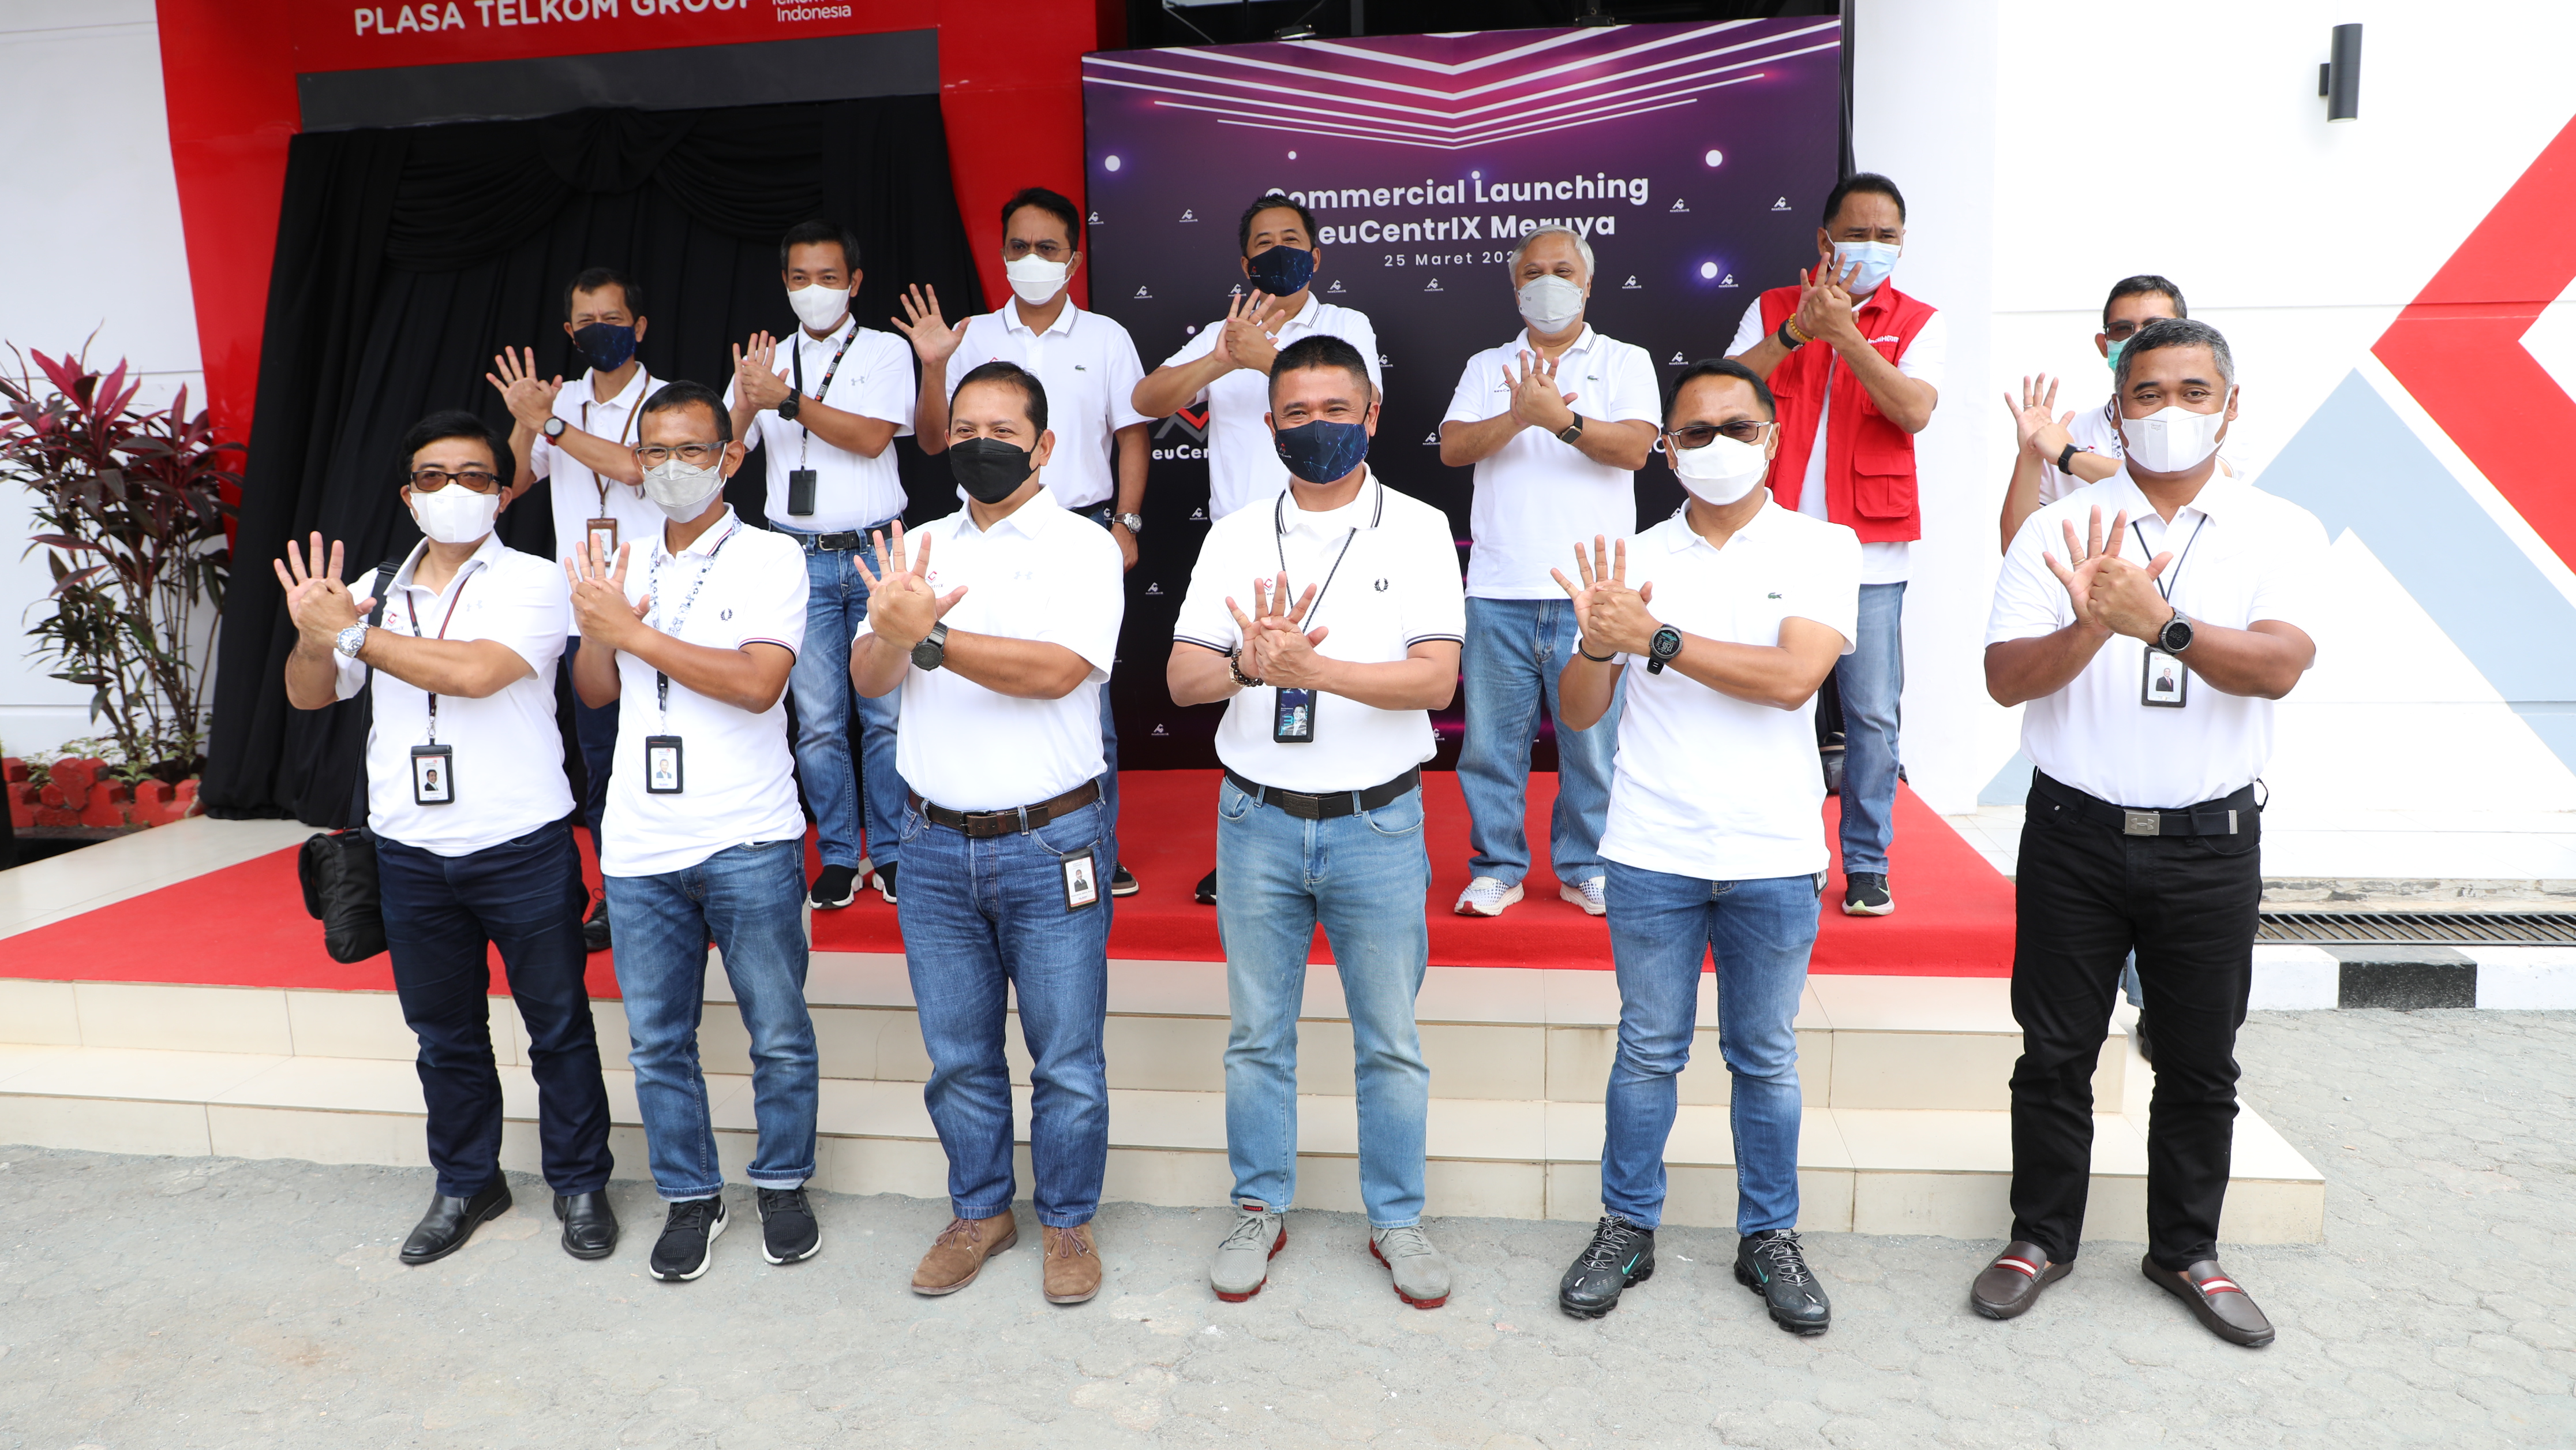 Peluncuran neuCentrIX Meruya, Data Center Tier 3 dari Telkom Indonesia